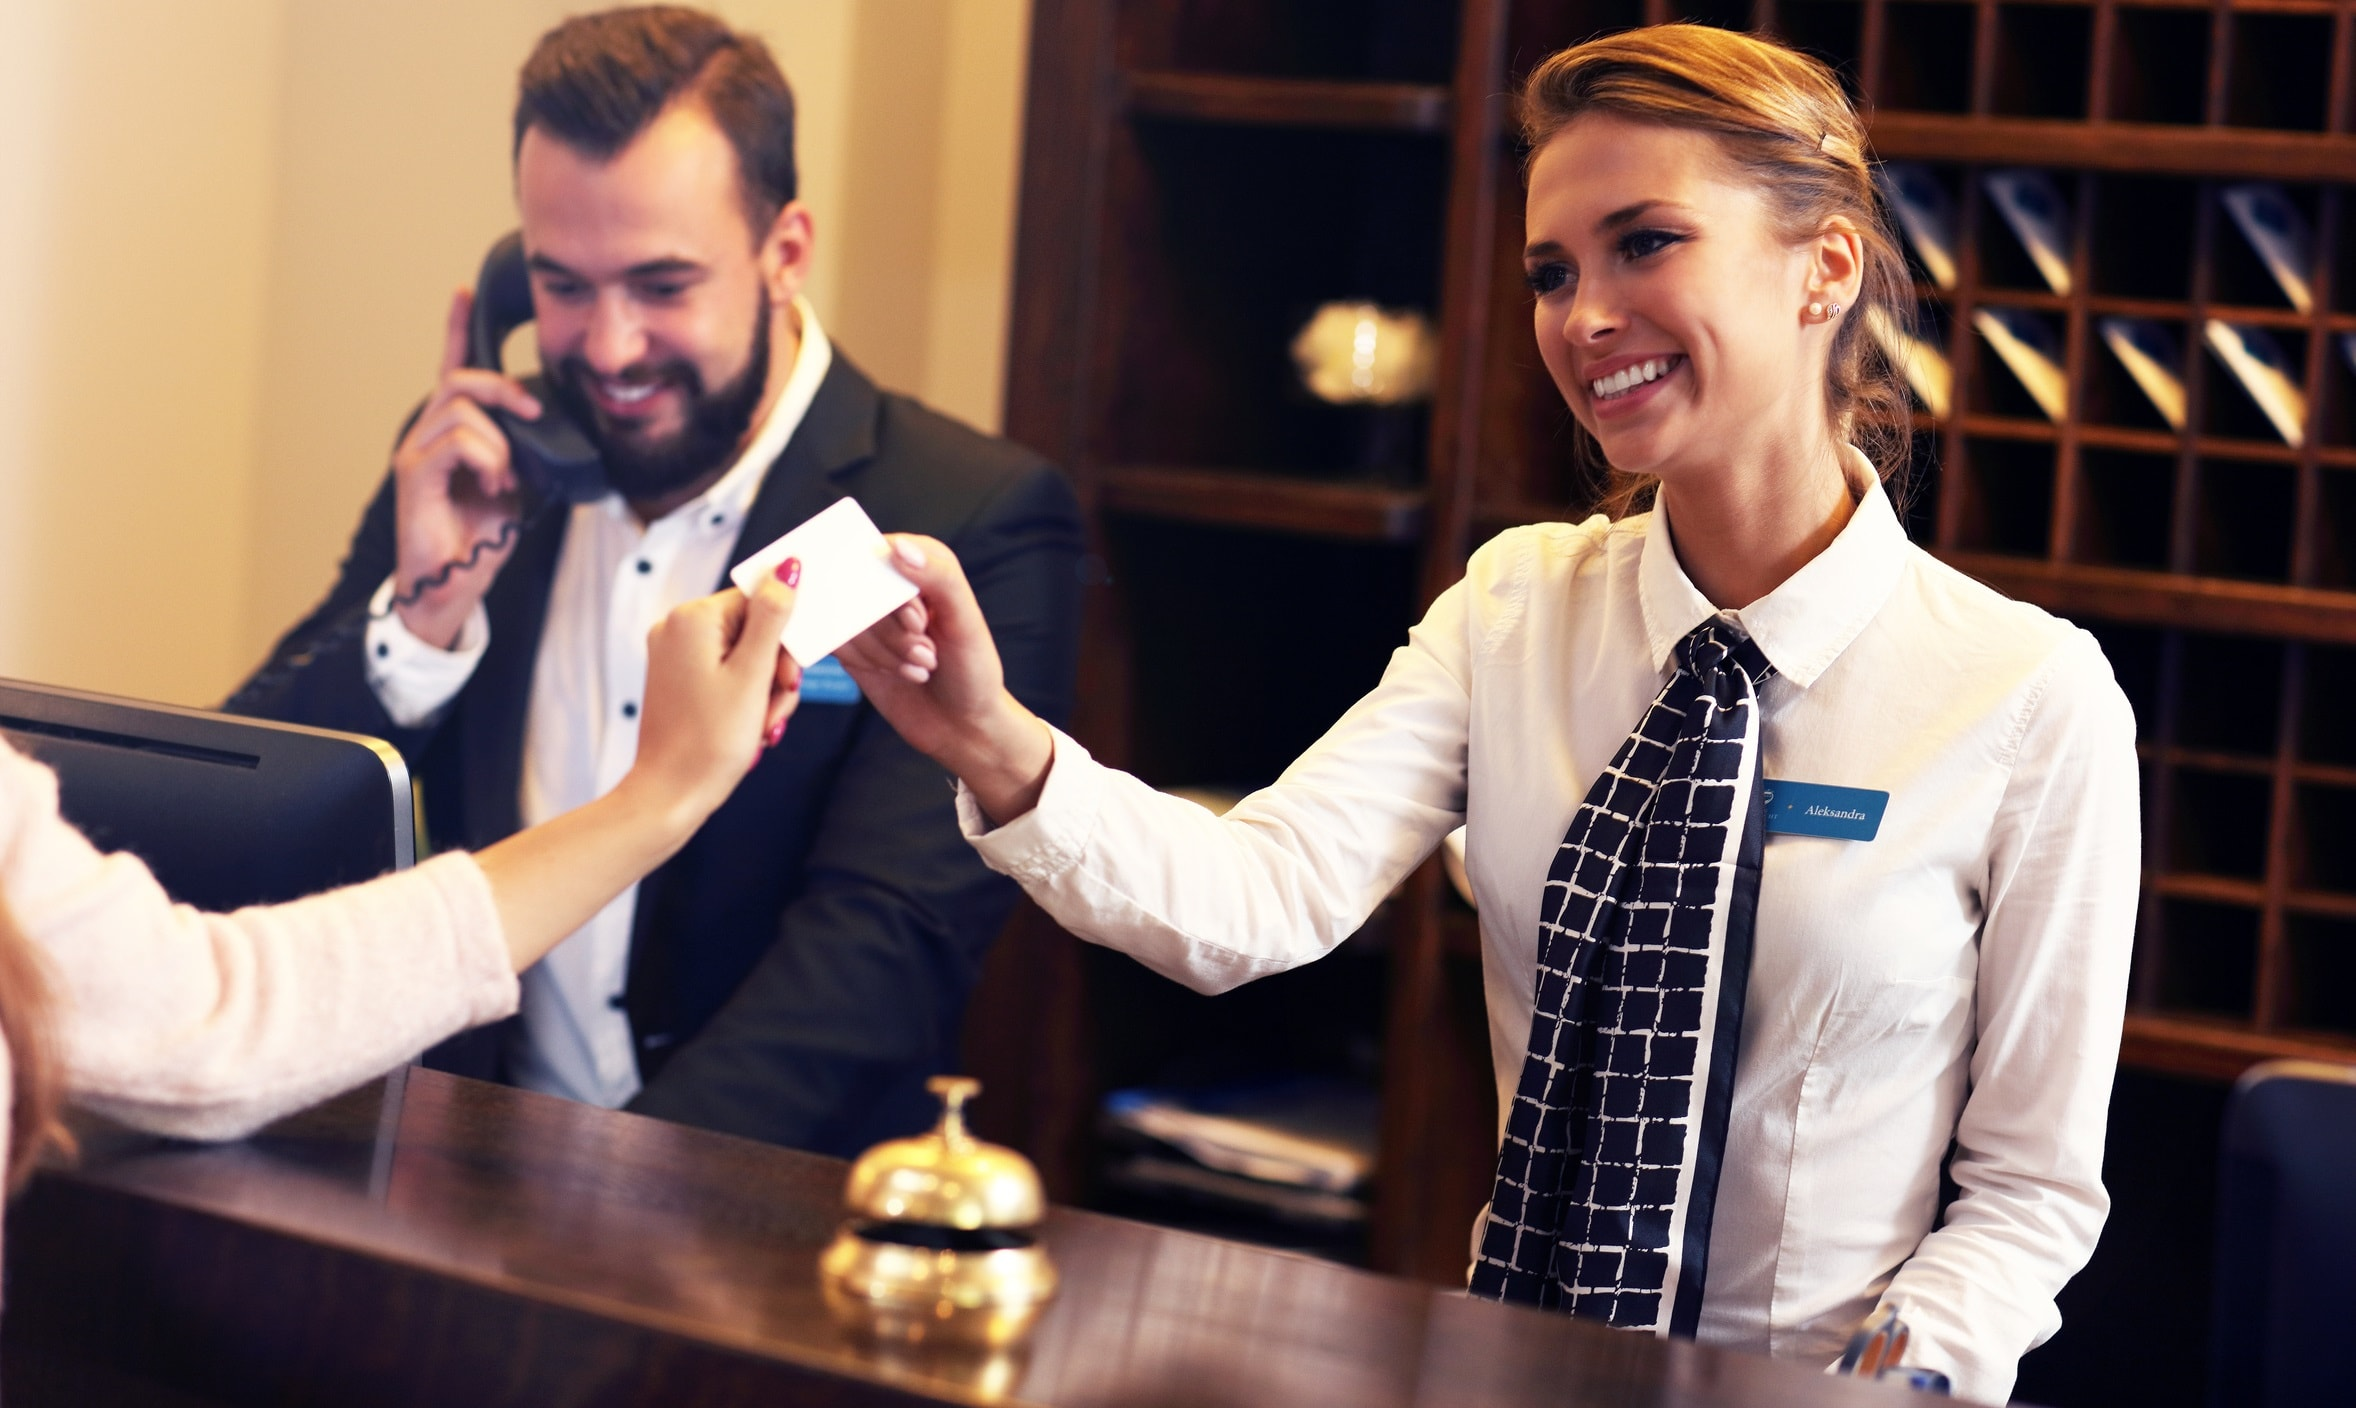 Gast erhält Key Card im Hotel